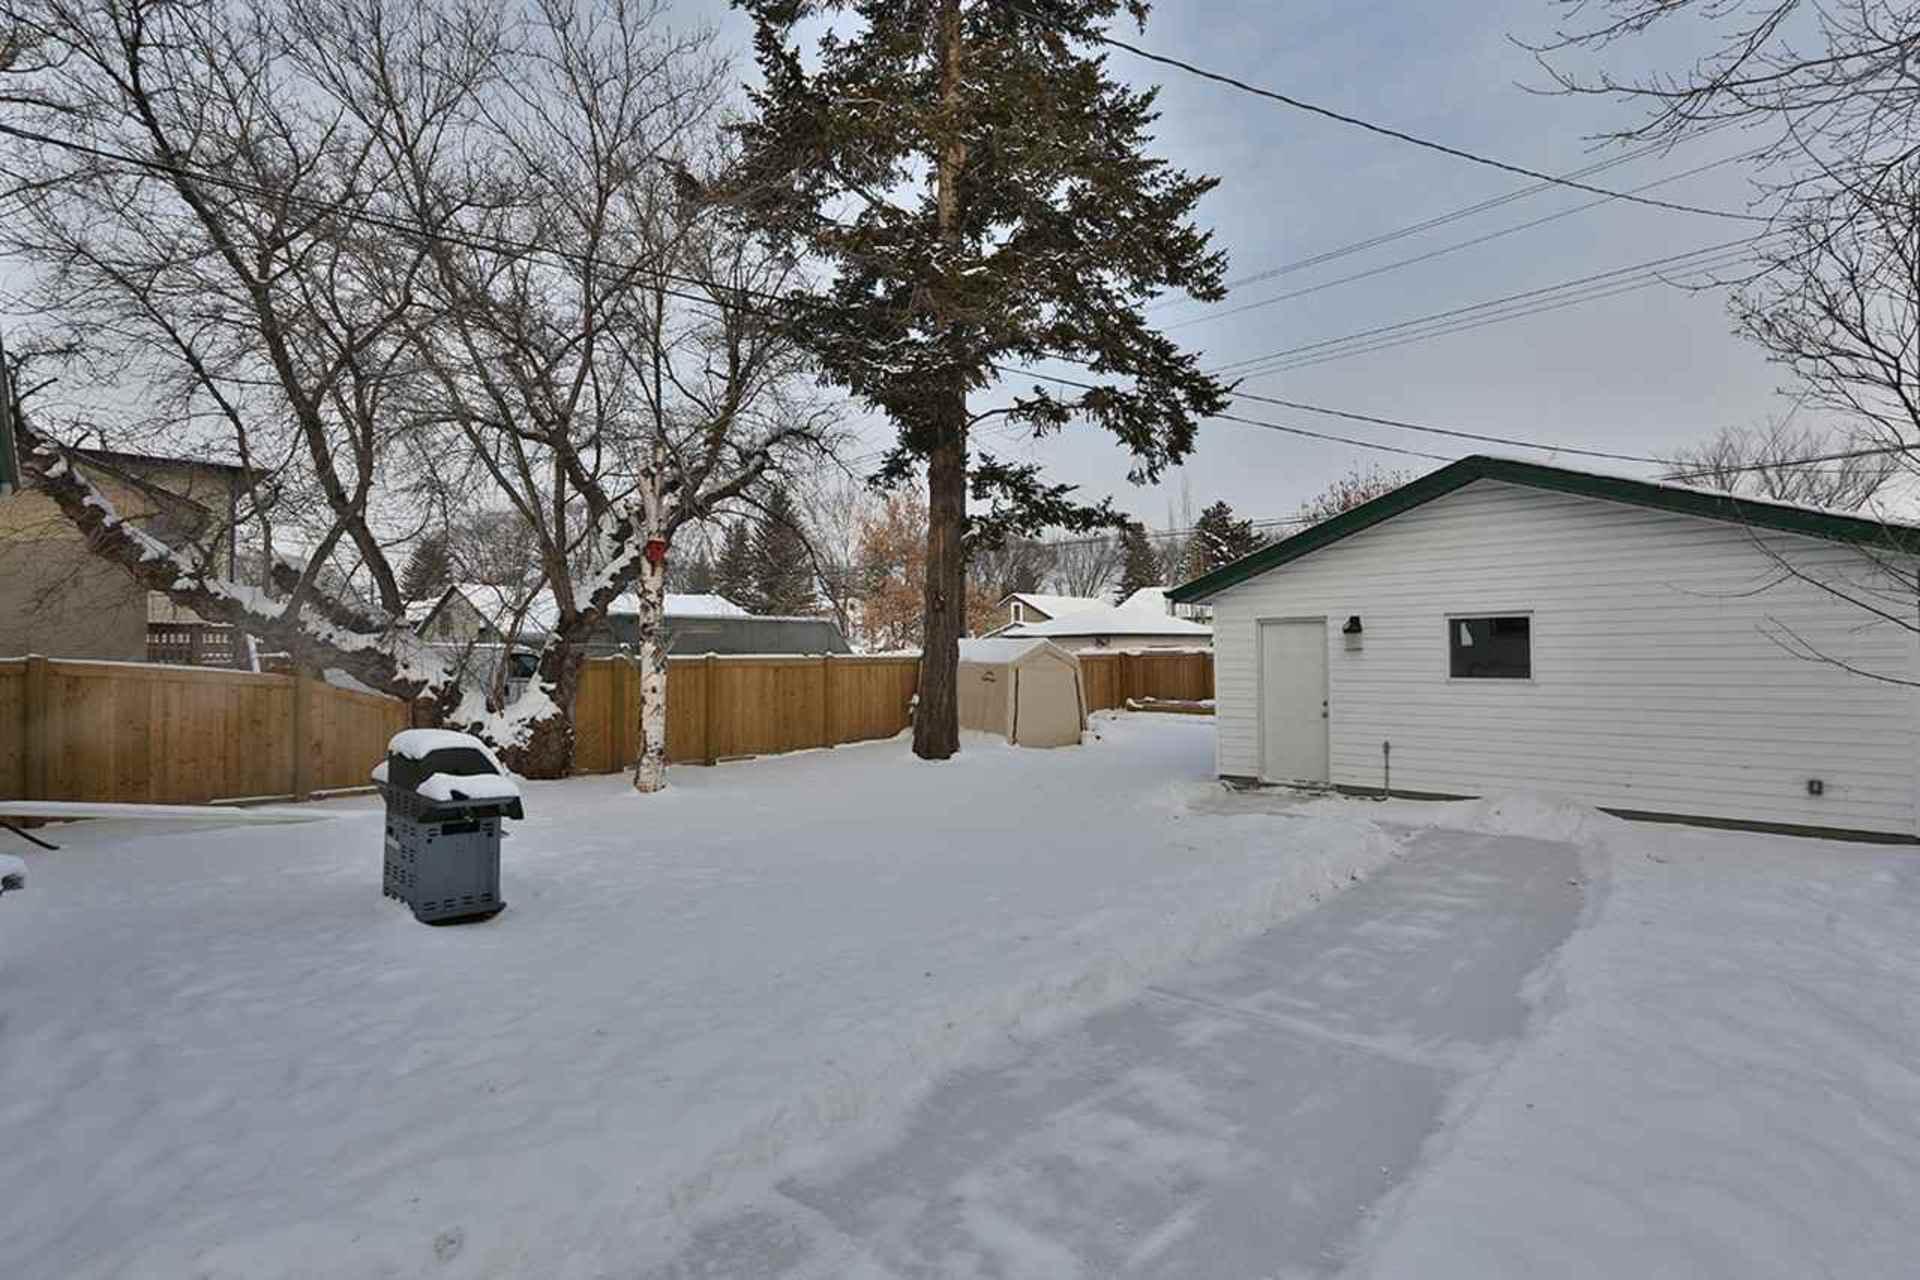 8336-76-avenue-king-edward-park-edmonton-11 at 8336 76 Avenue, King Edward Park, Edmonton